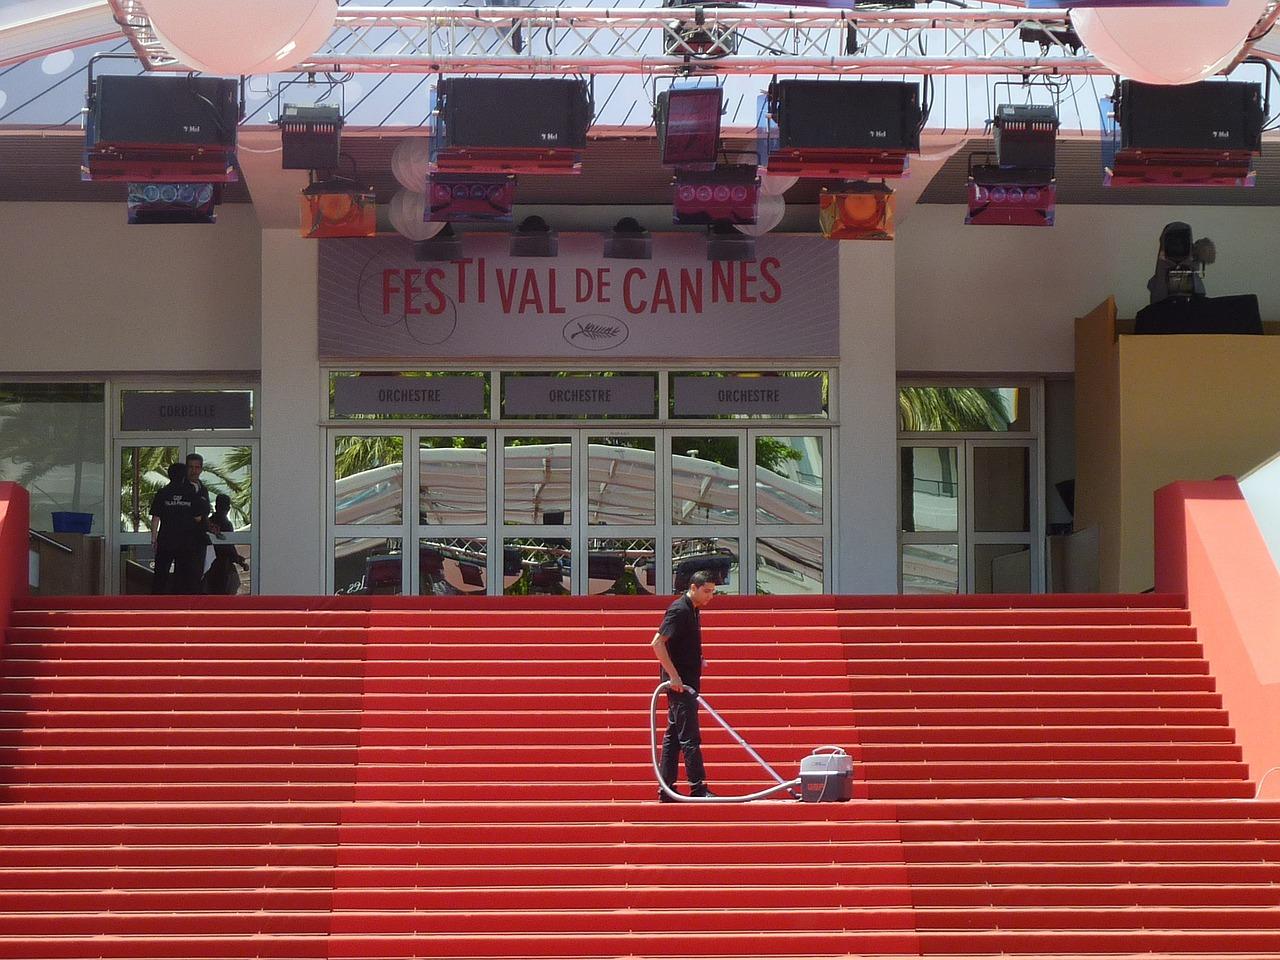 NFVCB, Filmmakers 'light up' Africa Pavillion at Cannes